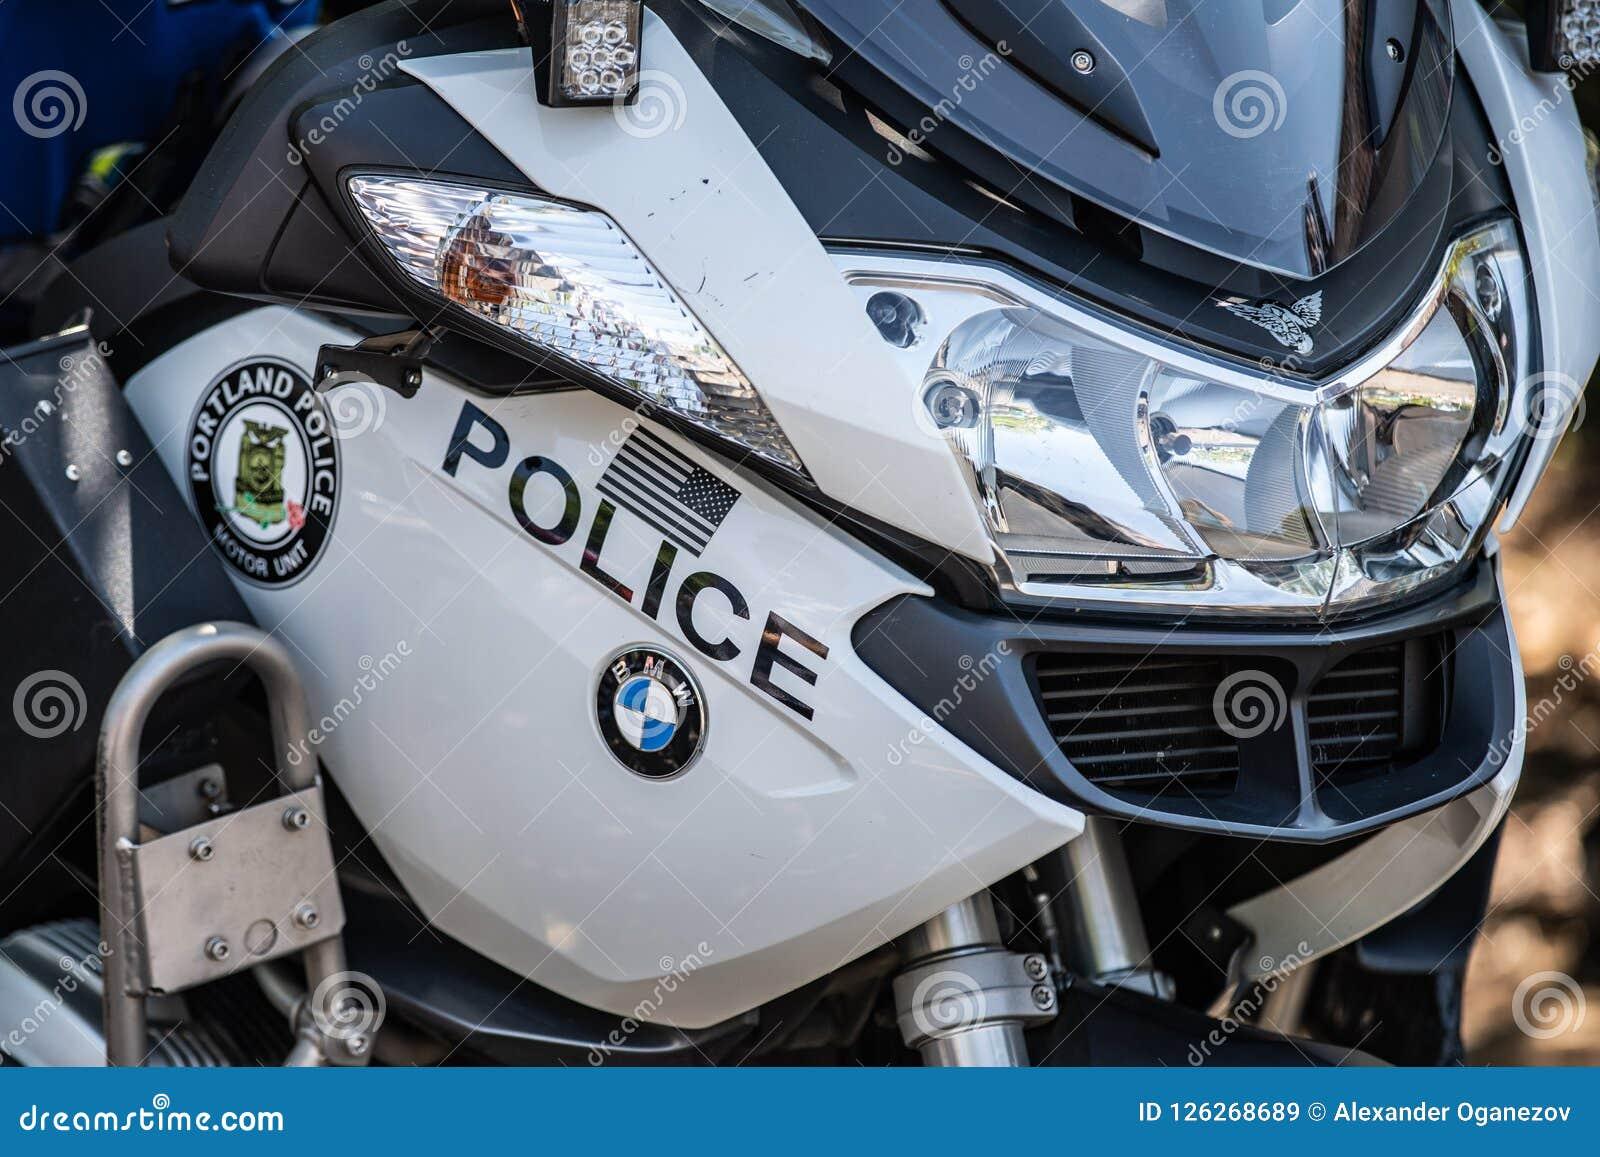 Dicht politiebmw motocyccle omhoog